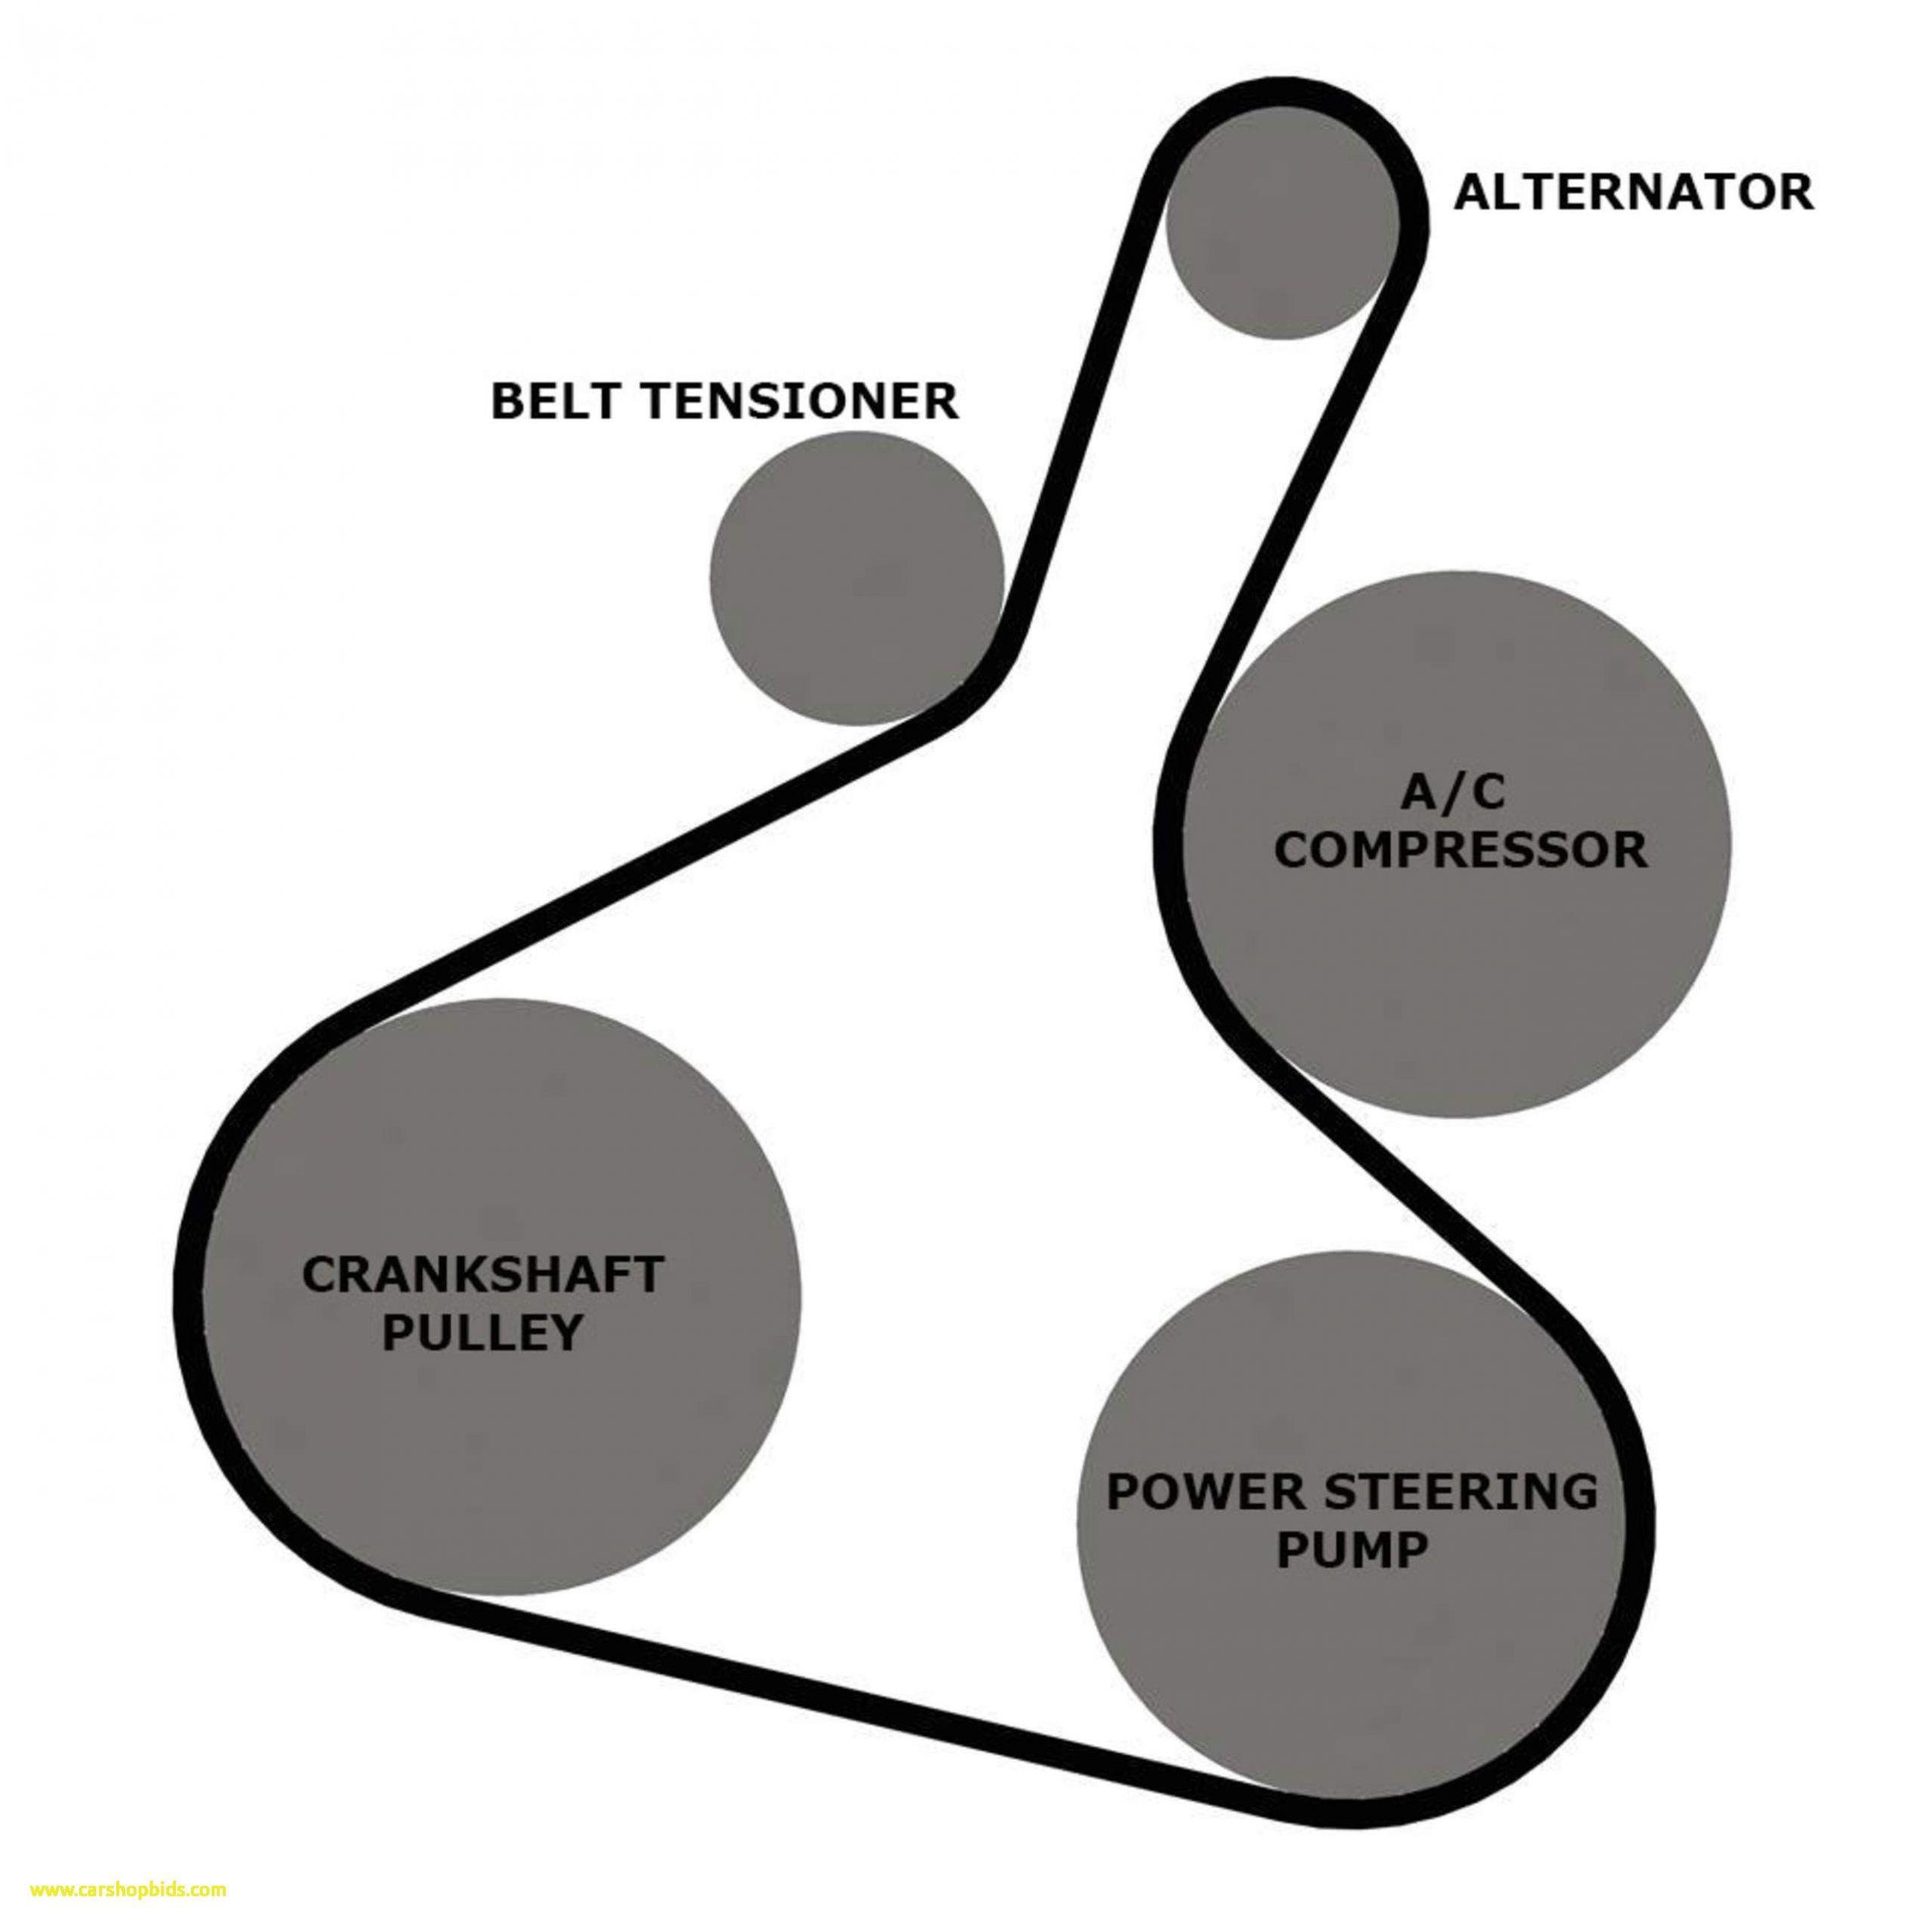 2009 Mitsubishi Lancer 2 0 Serpentine Belt Diagram In 2020 Alternator Diagram Vw Golf